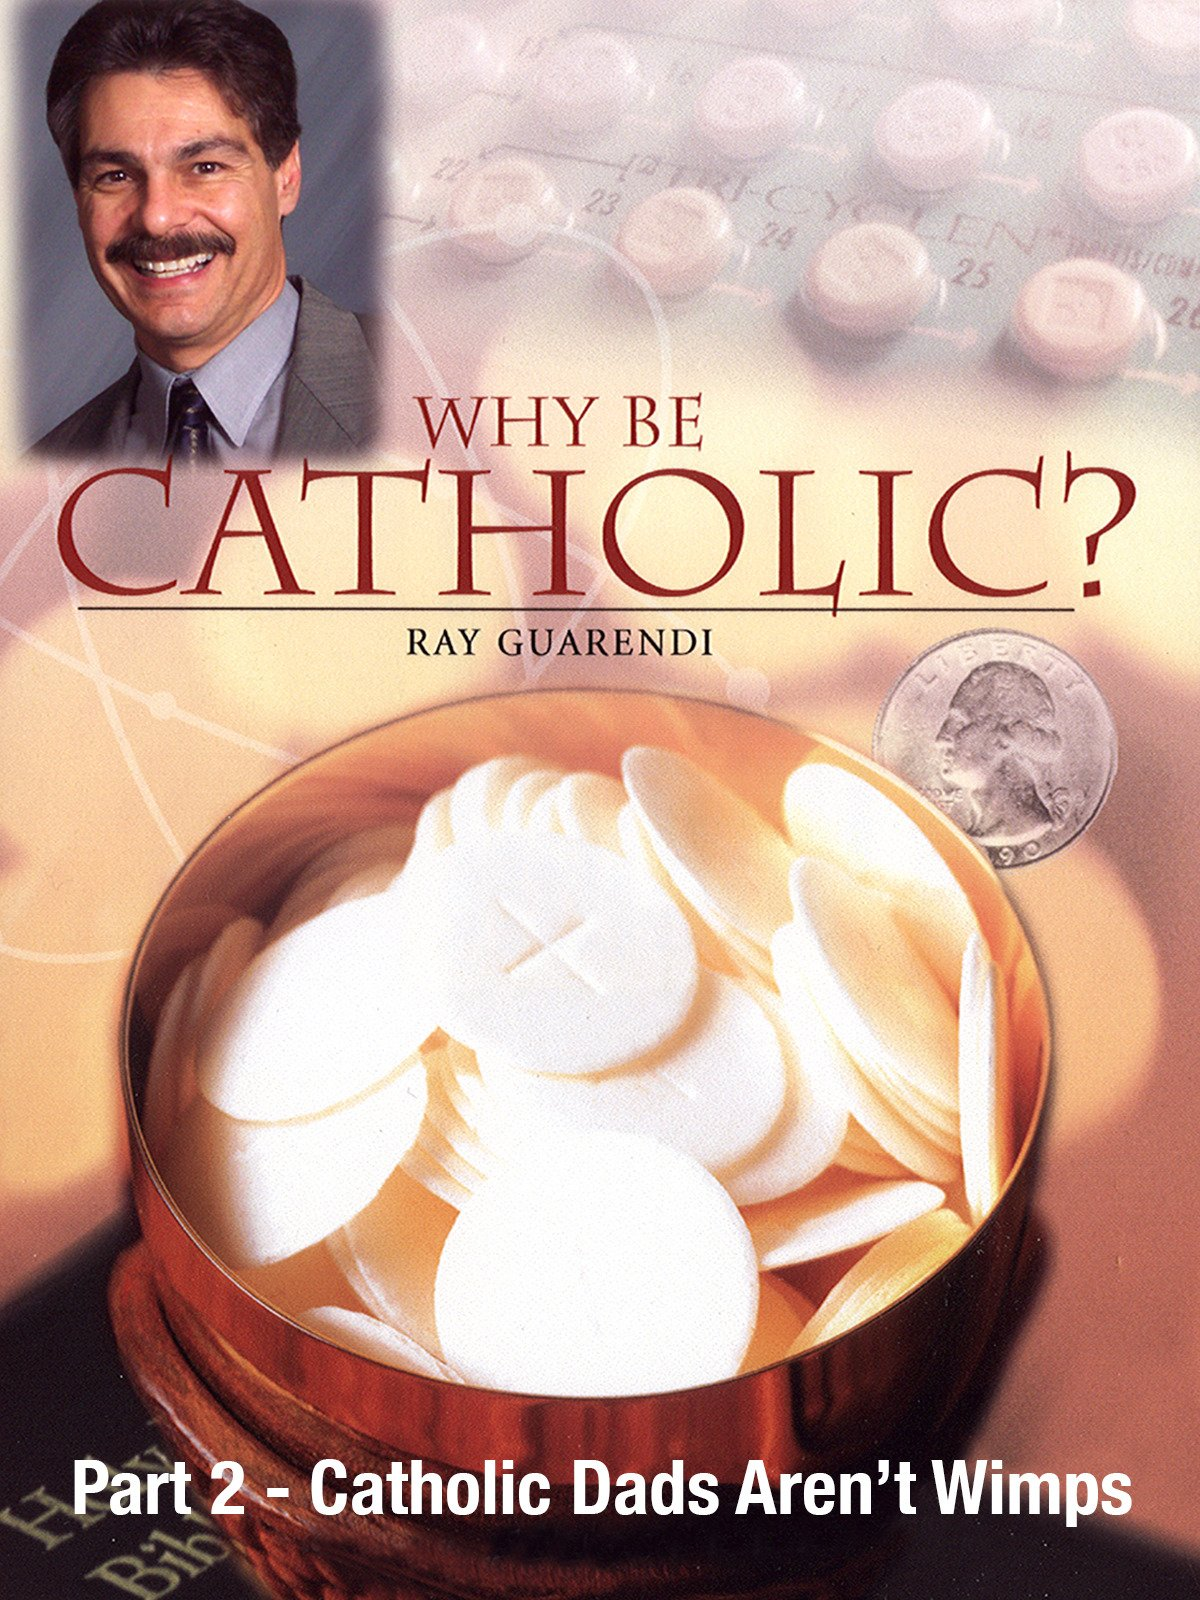 Why Be Catholic? - Part 2 - Catholic Dads Aren't Wimps on Amazon Prime Instant Video UK